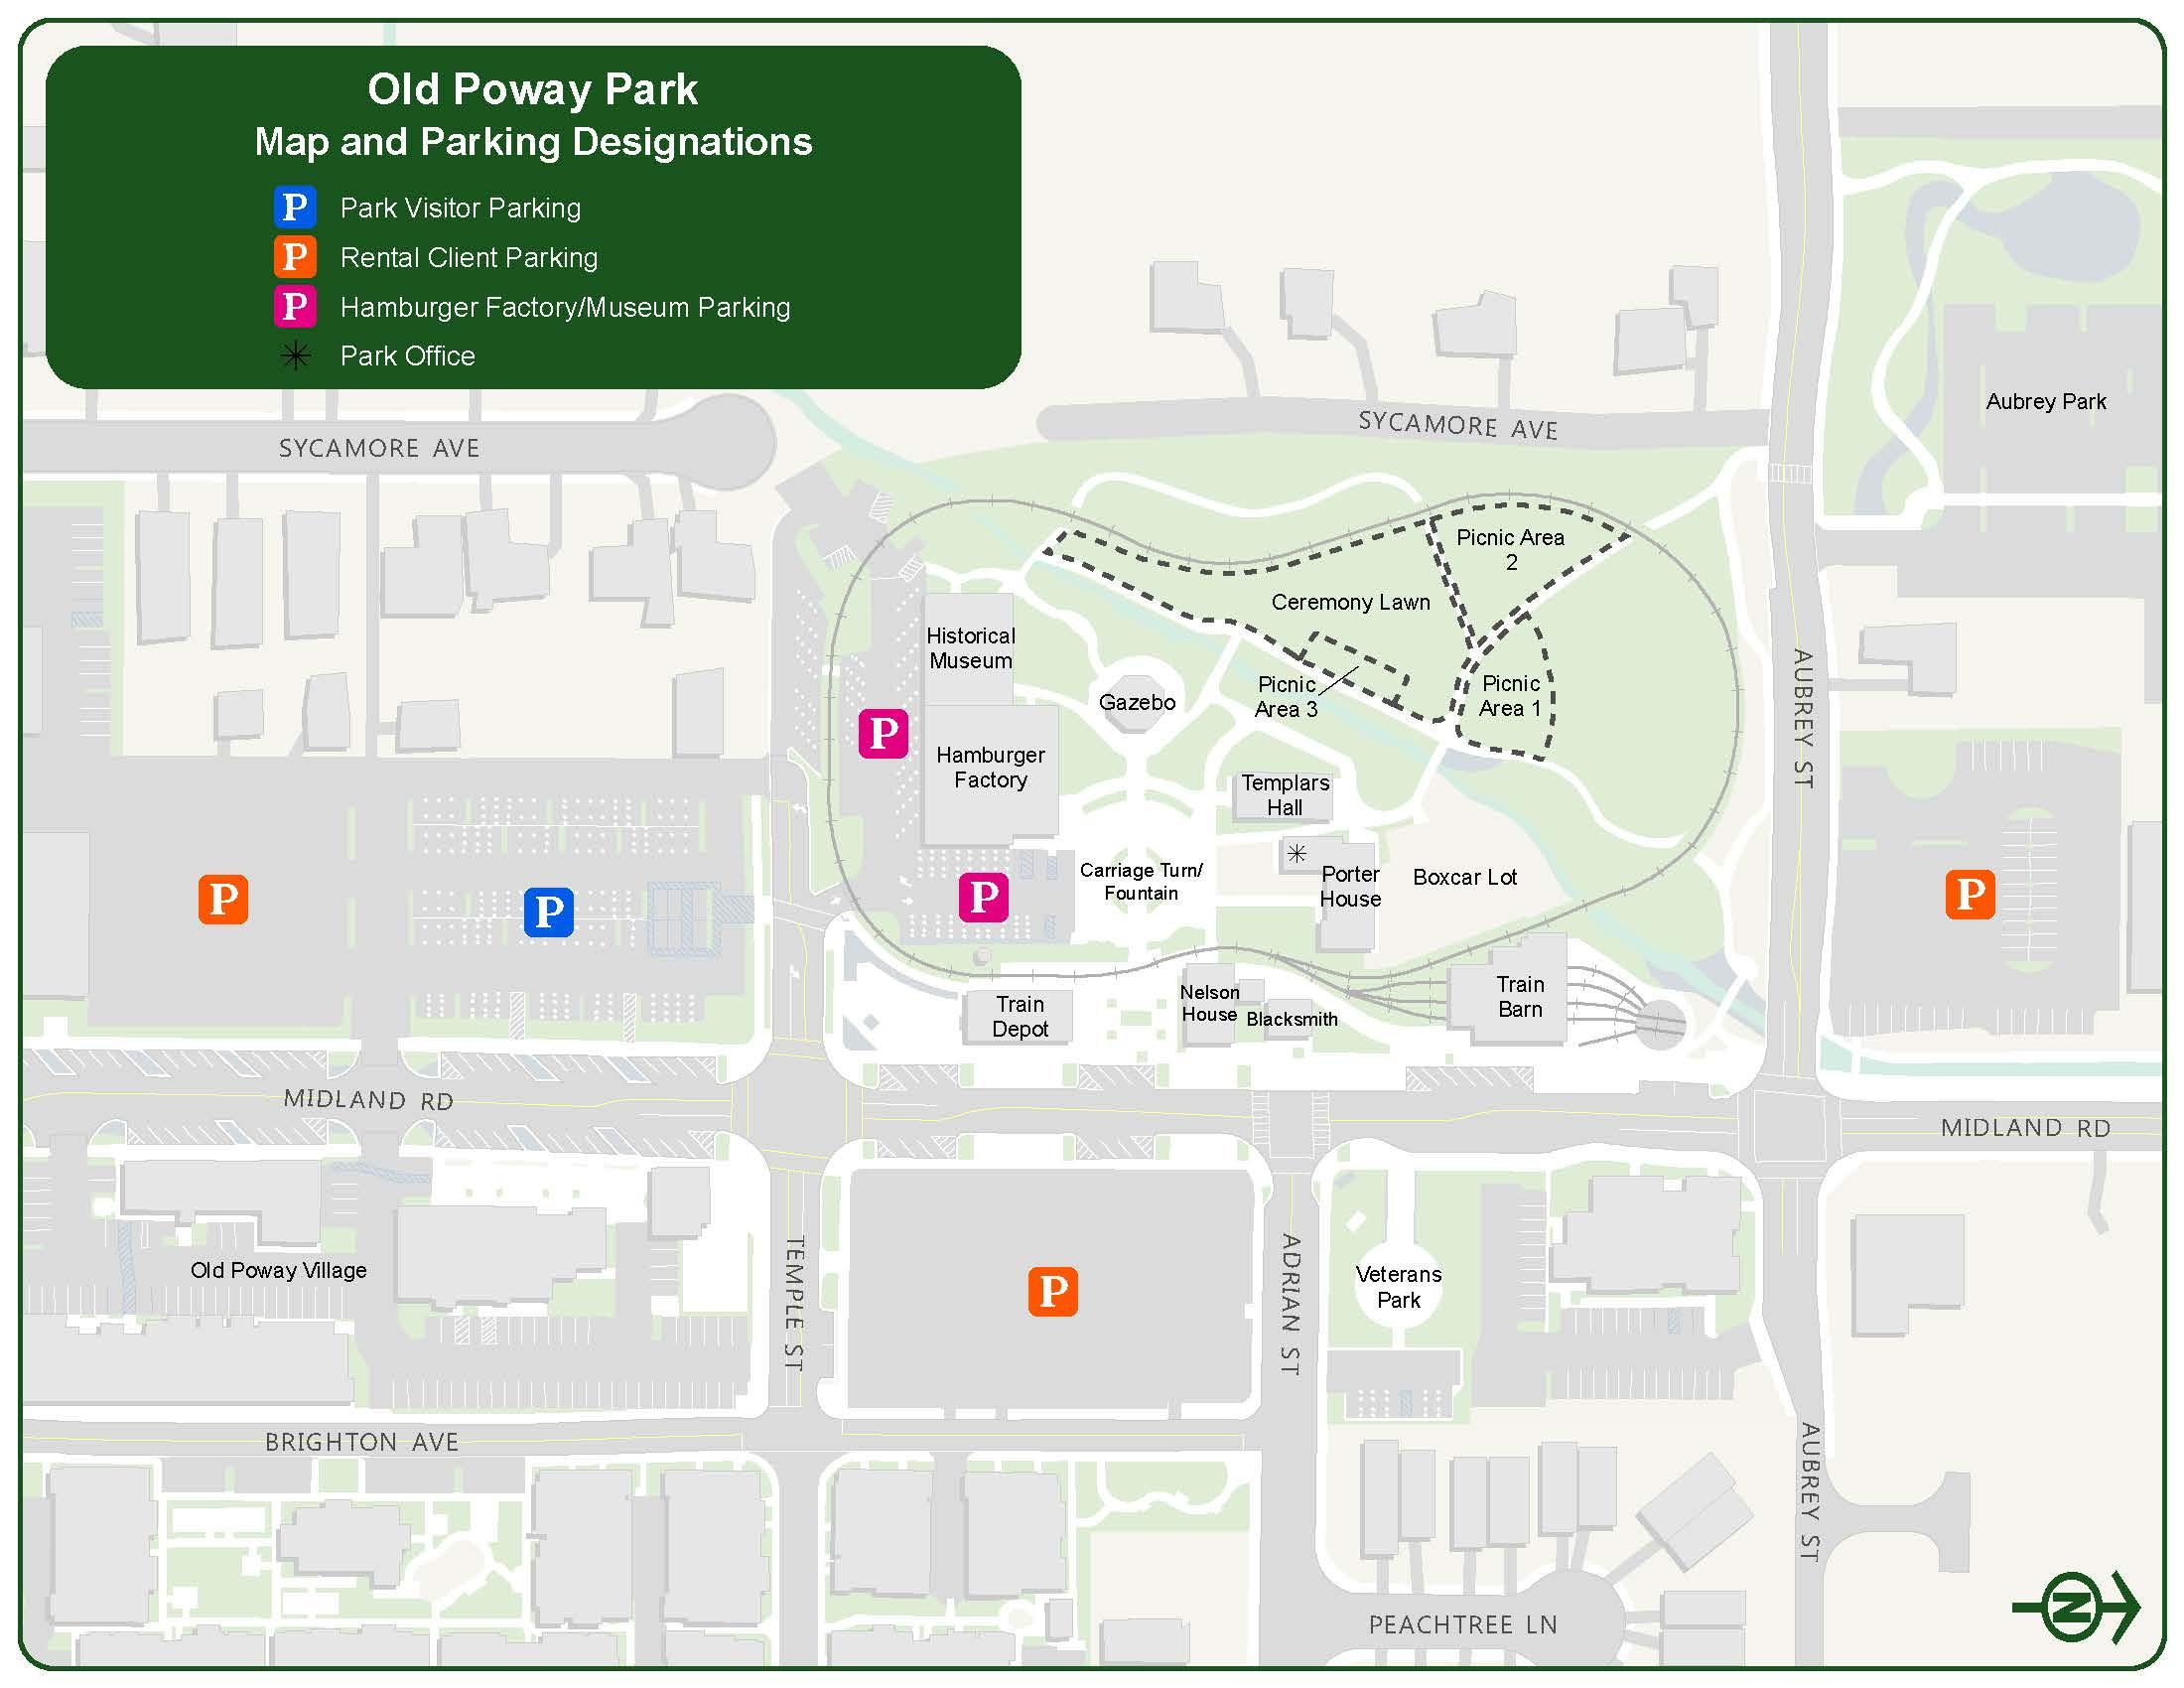 Poway California Map.Old Poway Park Poway Ca Official Website